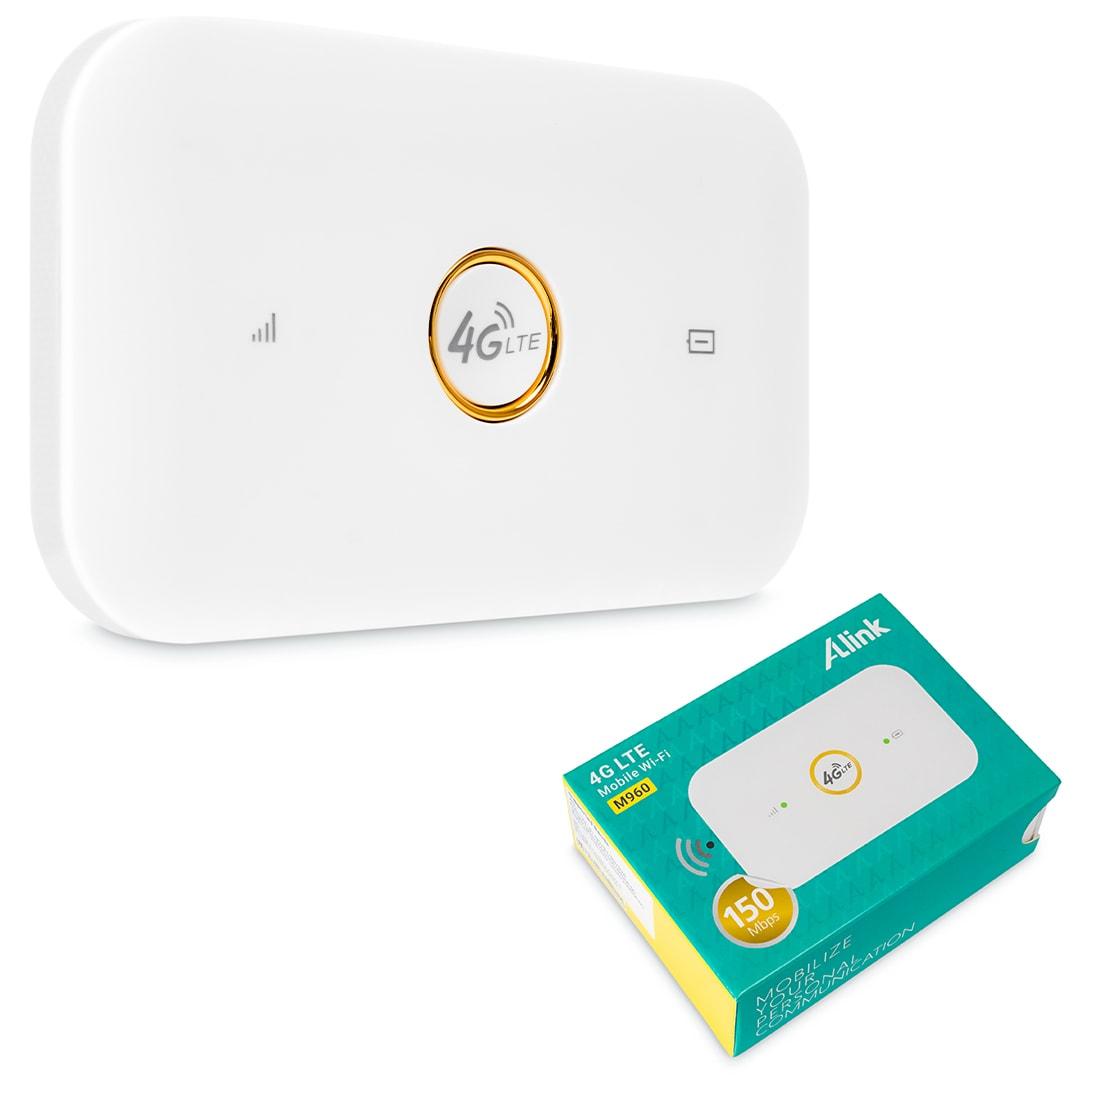 Router mobilny Alink M960 4G LTE 150Mbps SIM - 6